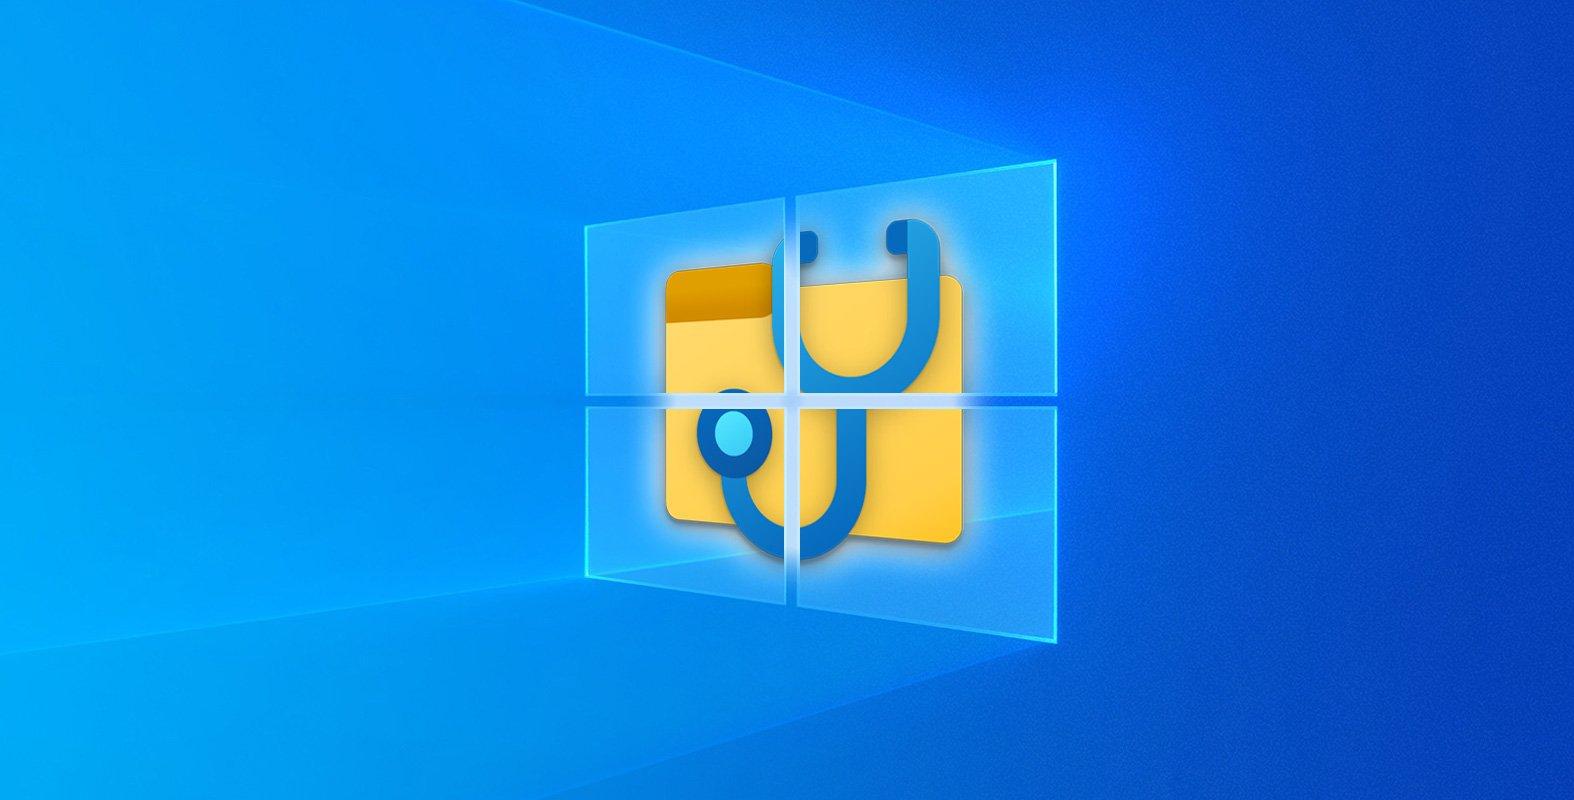 Windows 10 Folder Utility